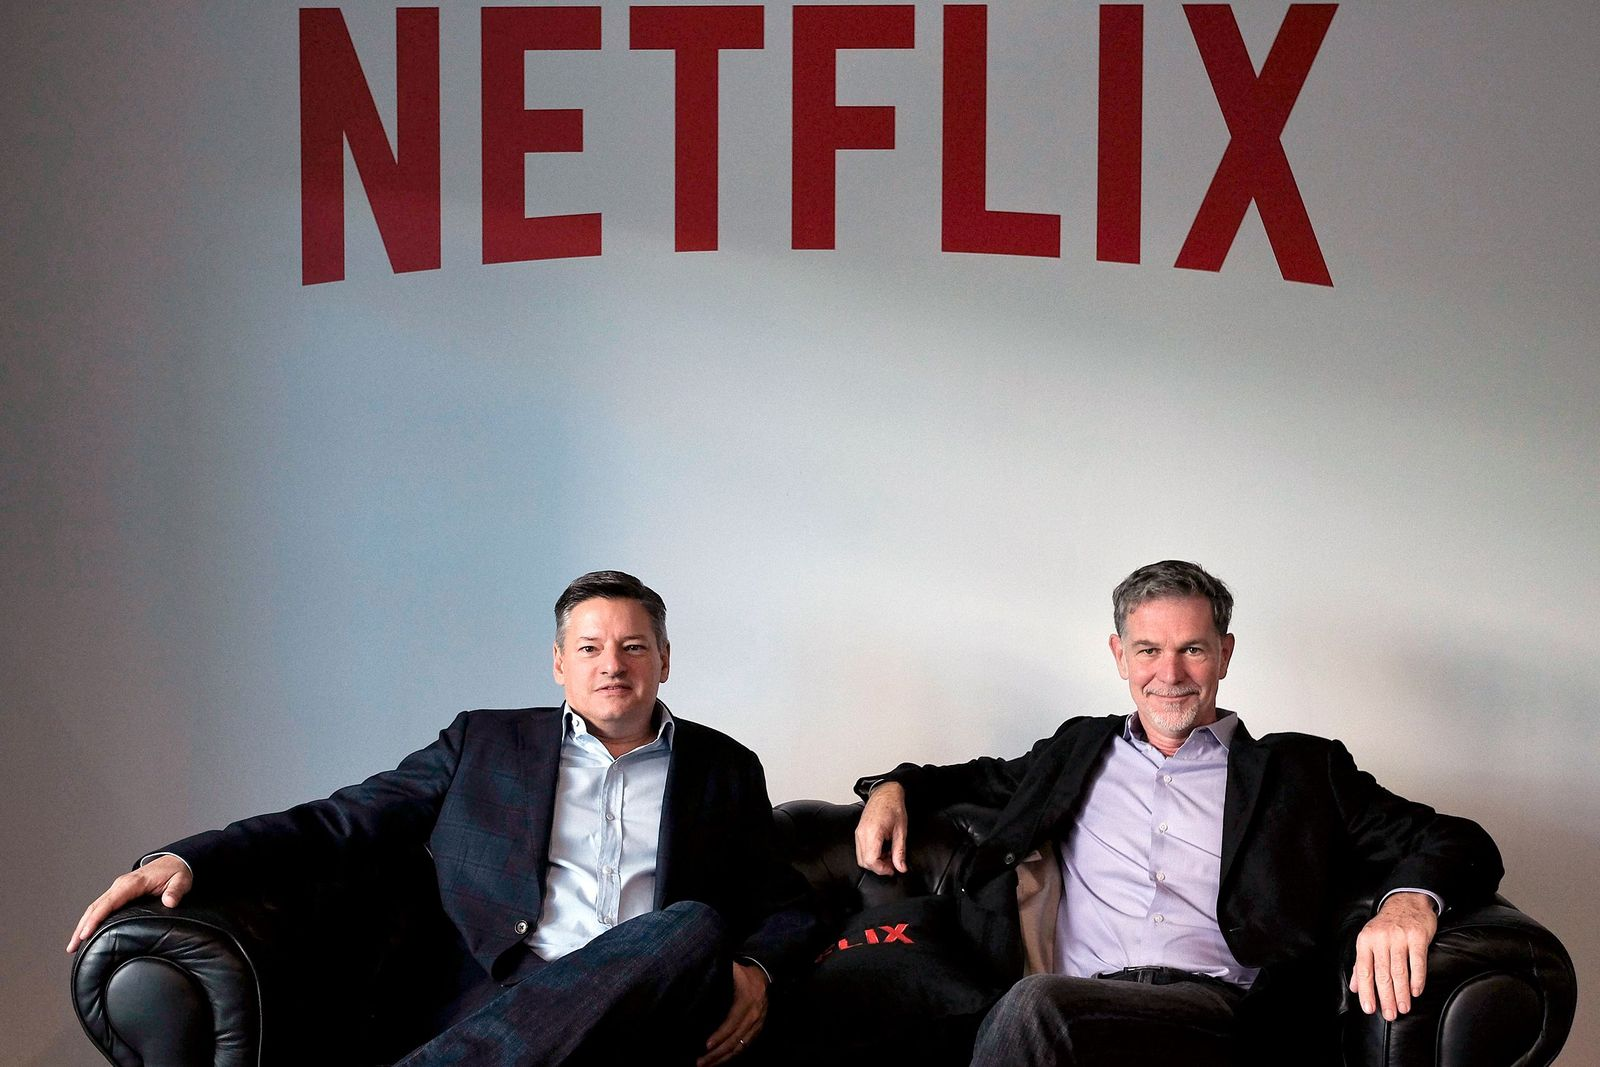 Netflix/ Sarandos & Hastings